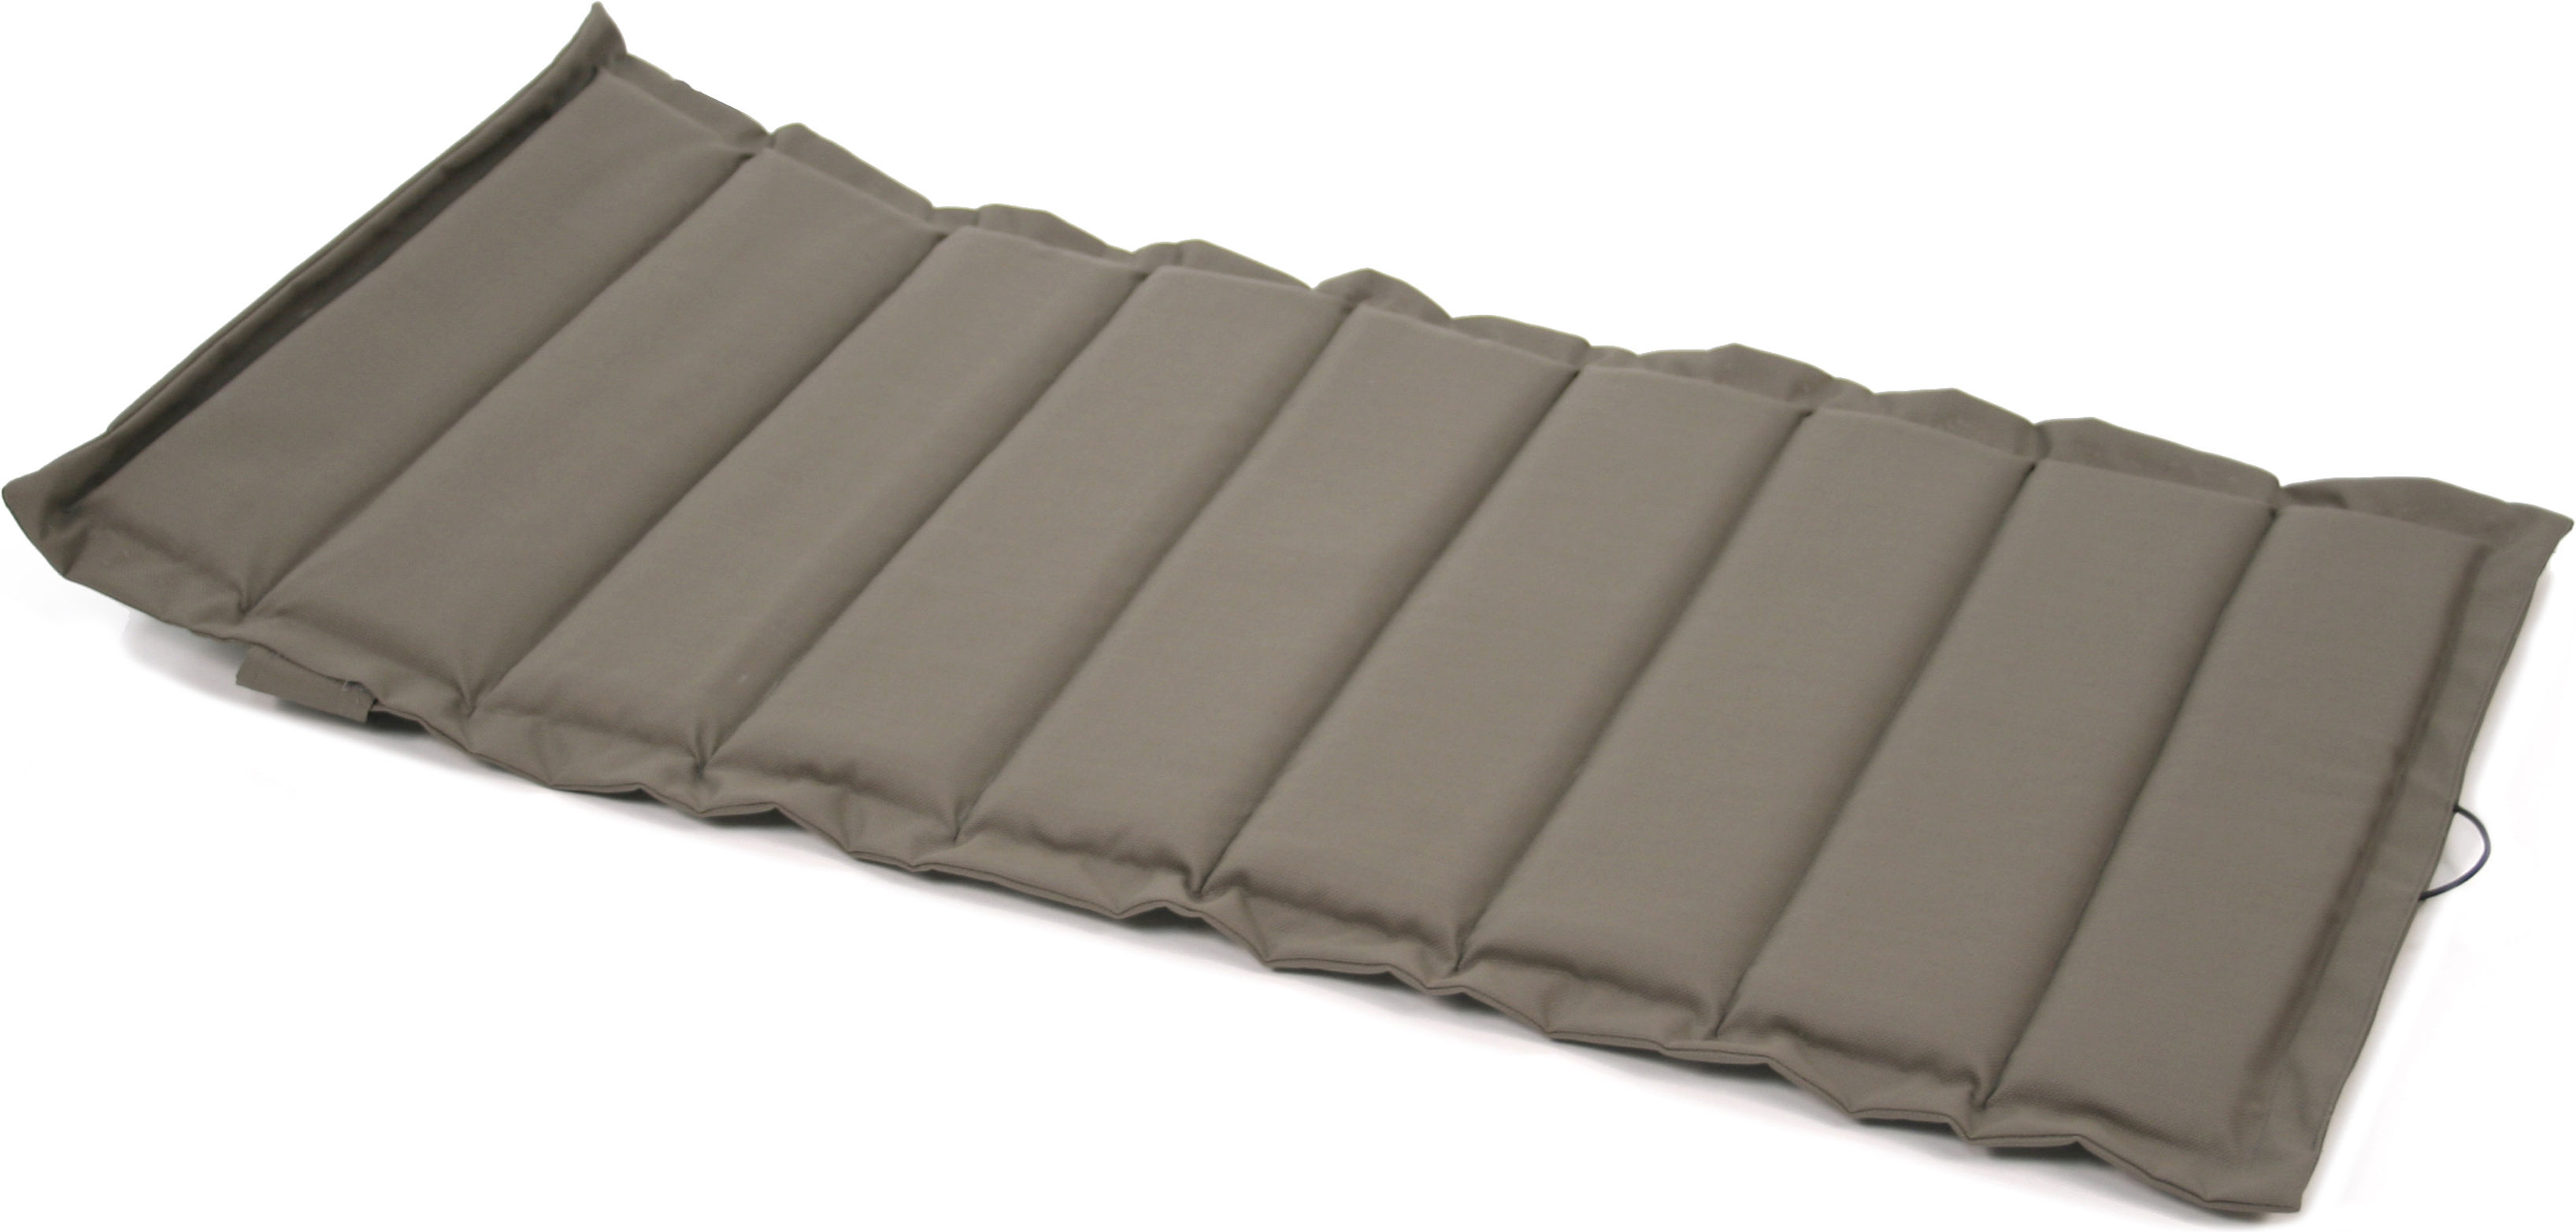 coussin d 39 ext rieur pour fauteuil bas luxembourg taupe fermob. Black Bedroom Furniture Sets. Home Design Ideas